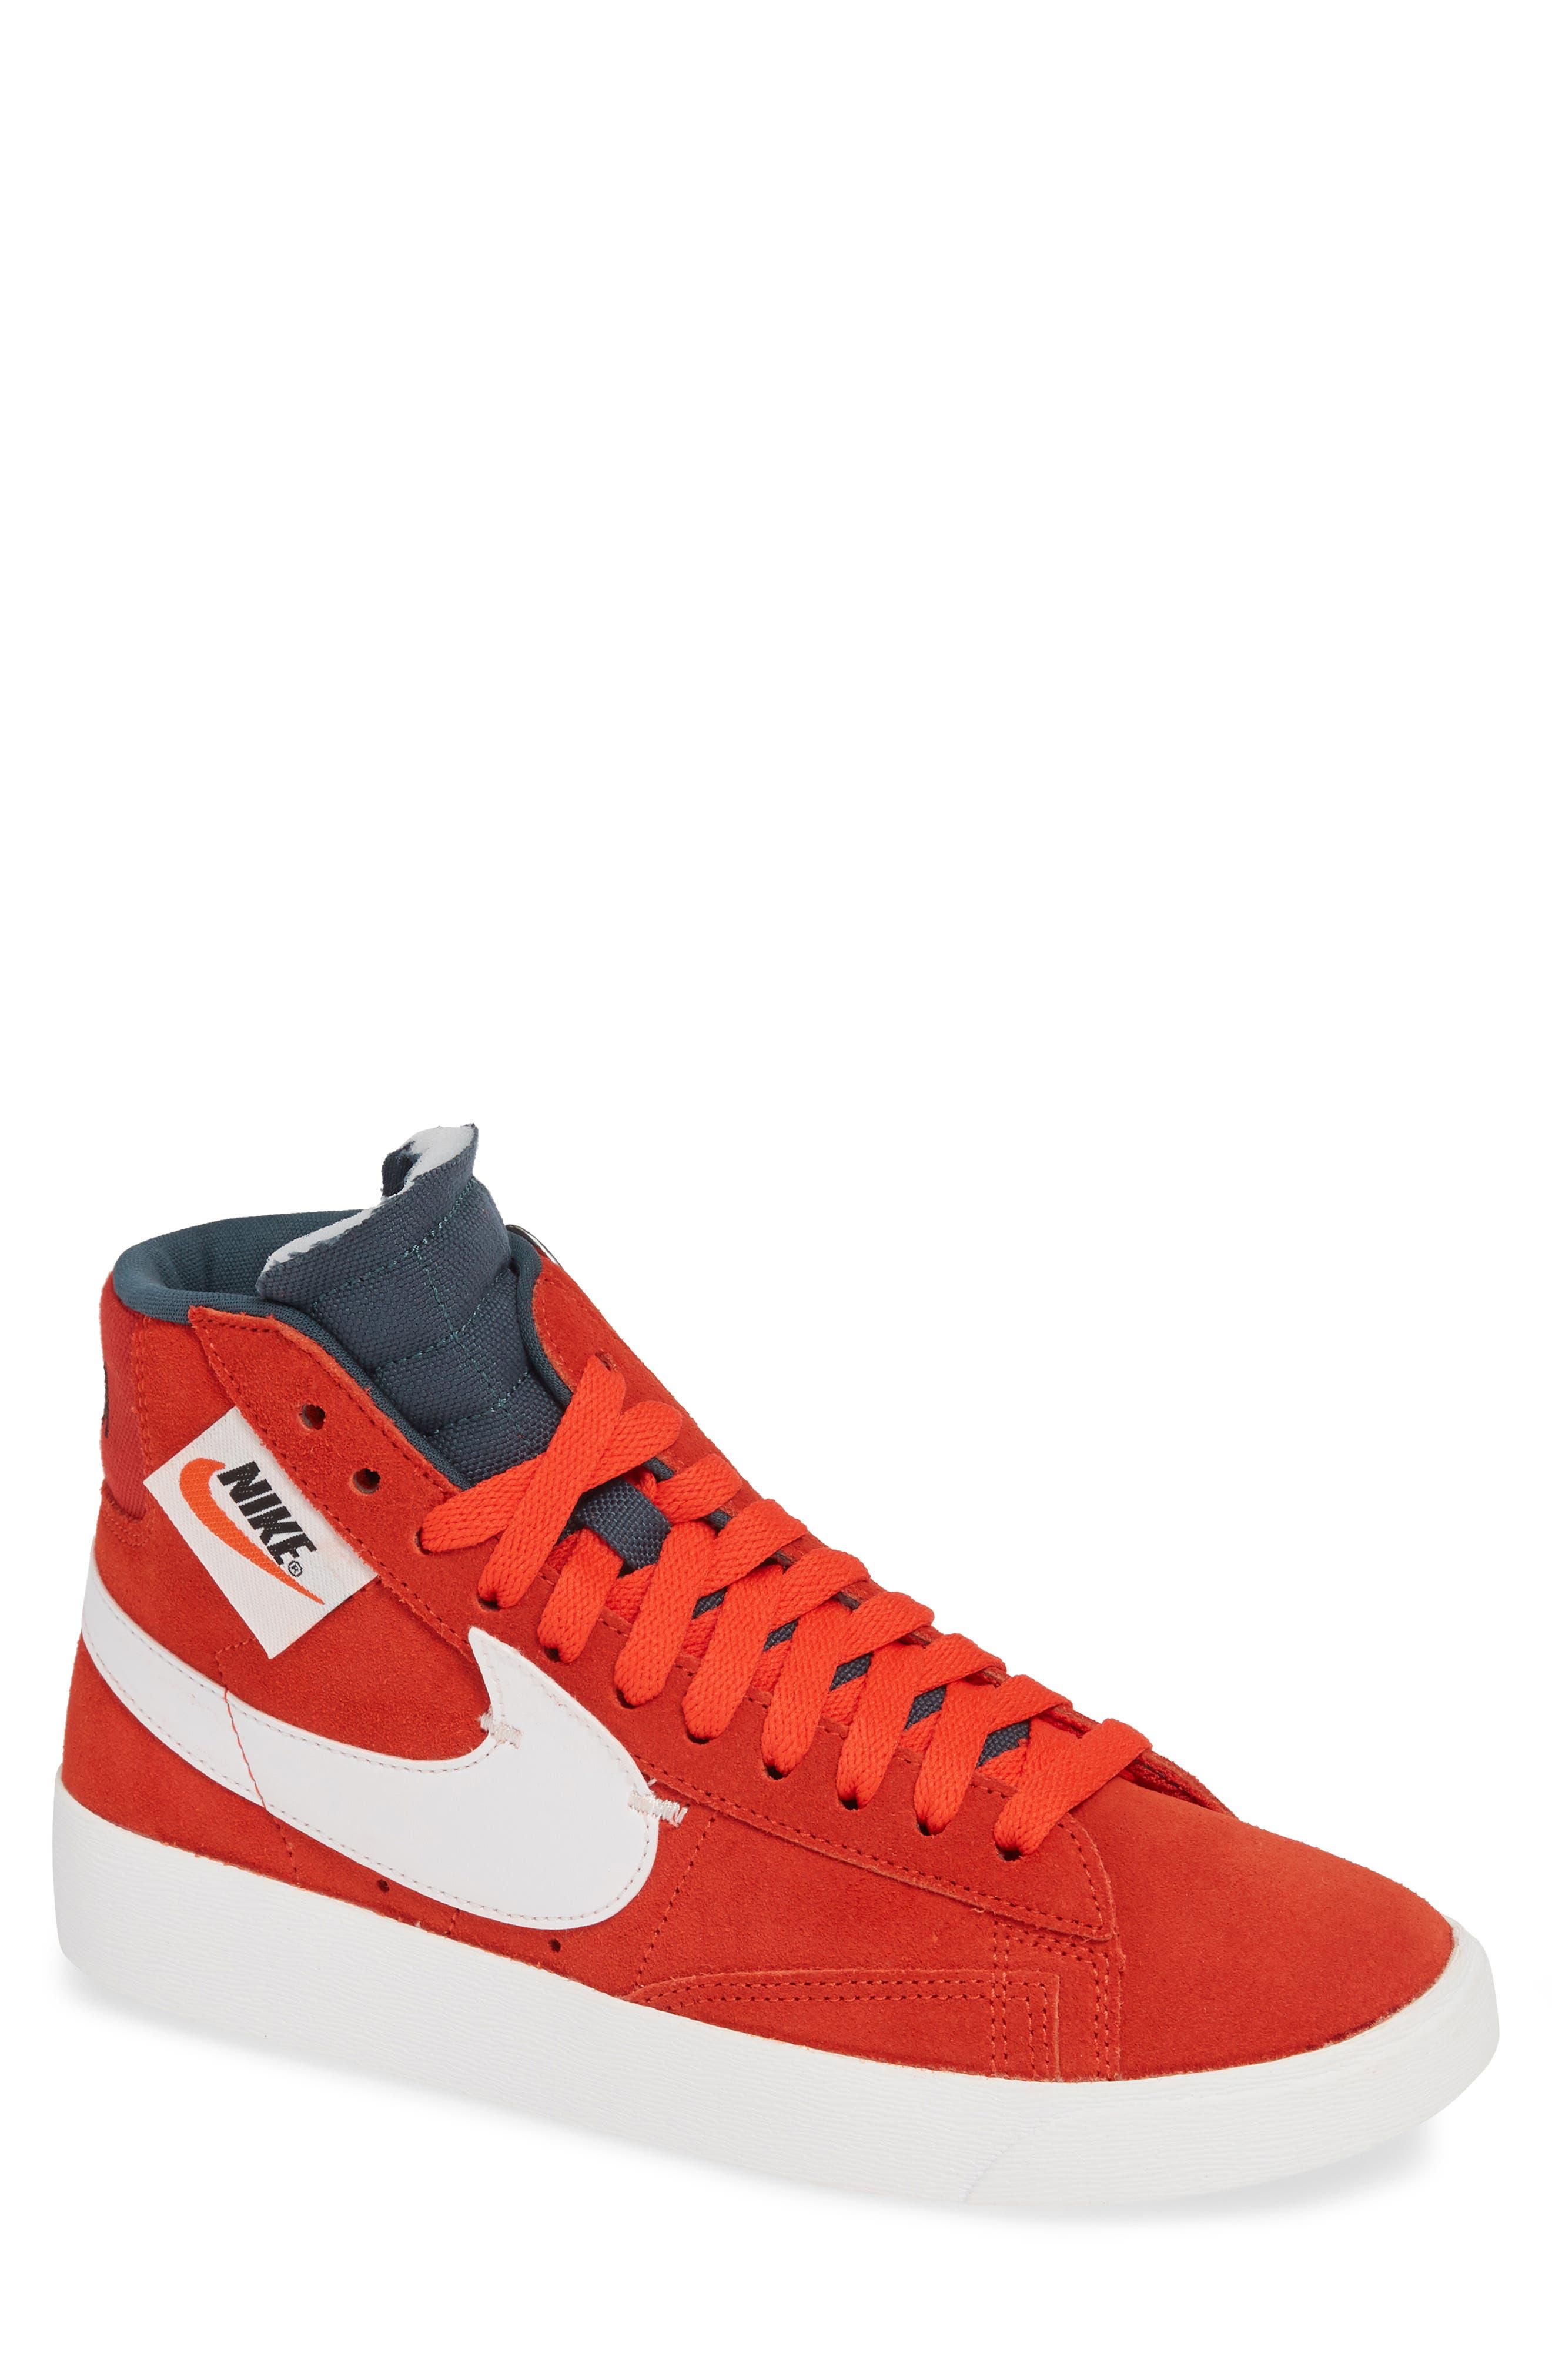 Blazer Mid Rebel Sneaker,                             Main thumbnail 1, color,                             HABANERO/ WHITE/ BLACK/ SPRUCE